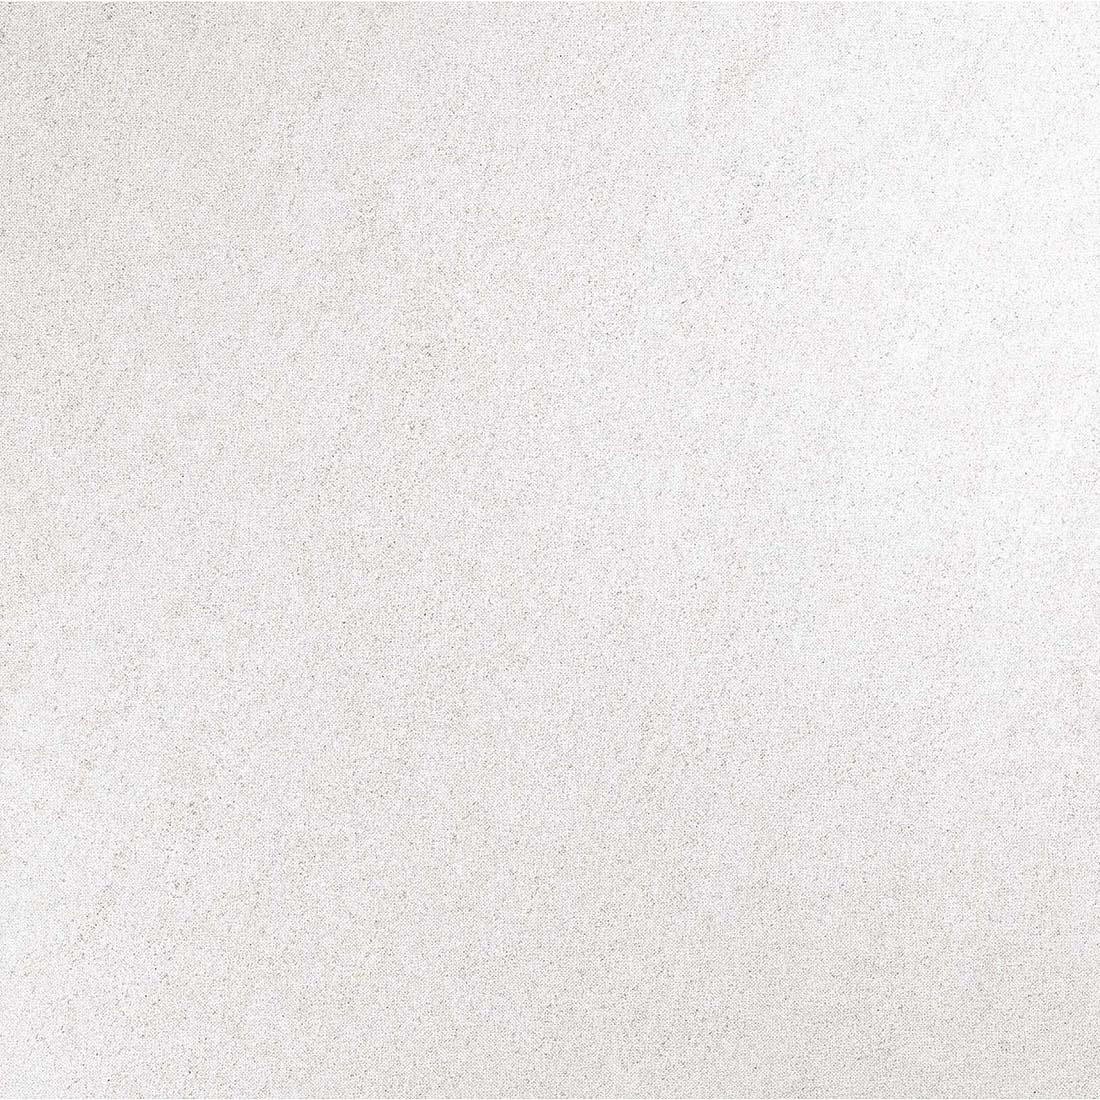 Wonder 80x80 Blanco Gloss